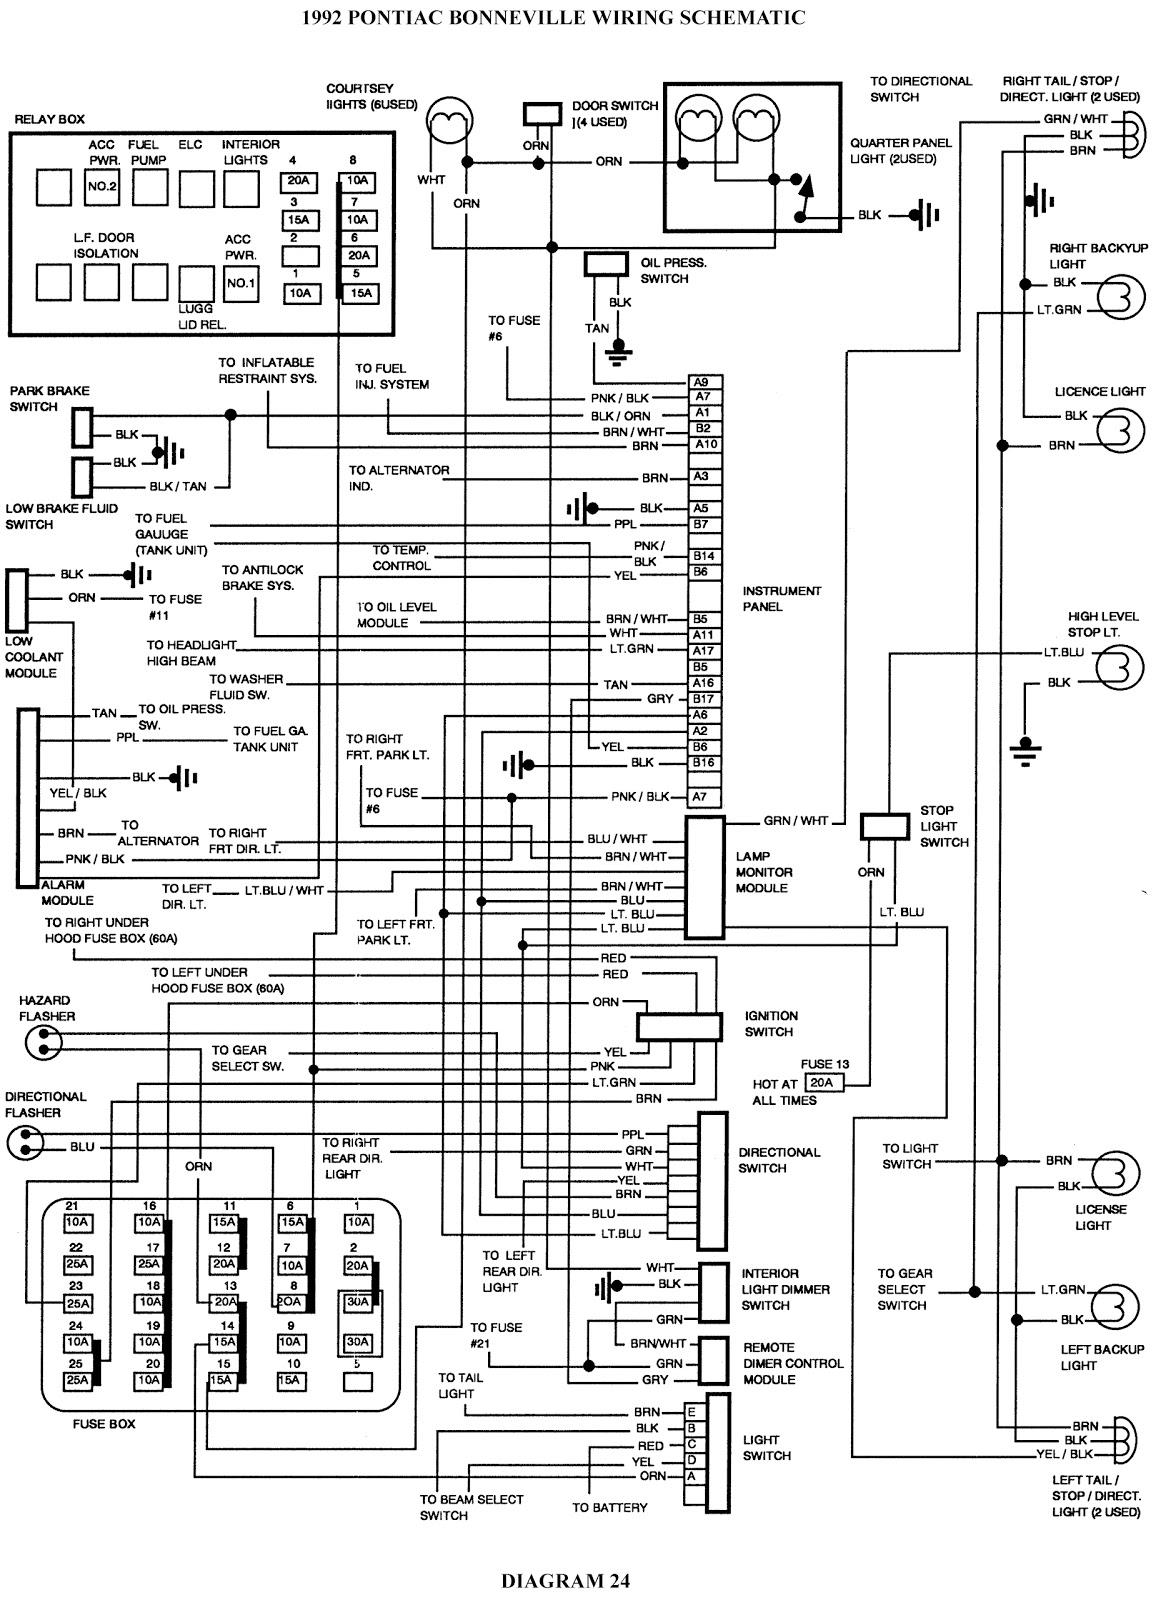 2002 pontiac bonneville wiring diagrams detailed wiring diagram rh 7 6 ocotillo paysage com 2002 pontiac sunfire wiring diagram 2002 pontiac sunfire wiring  [ 1161 x 1600 Pixel ]